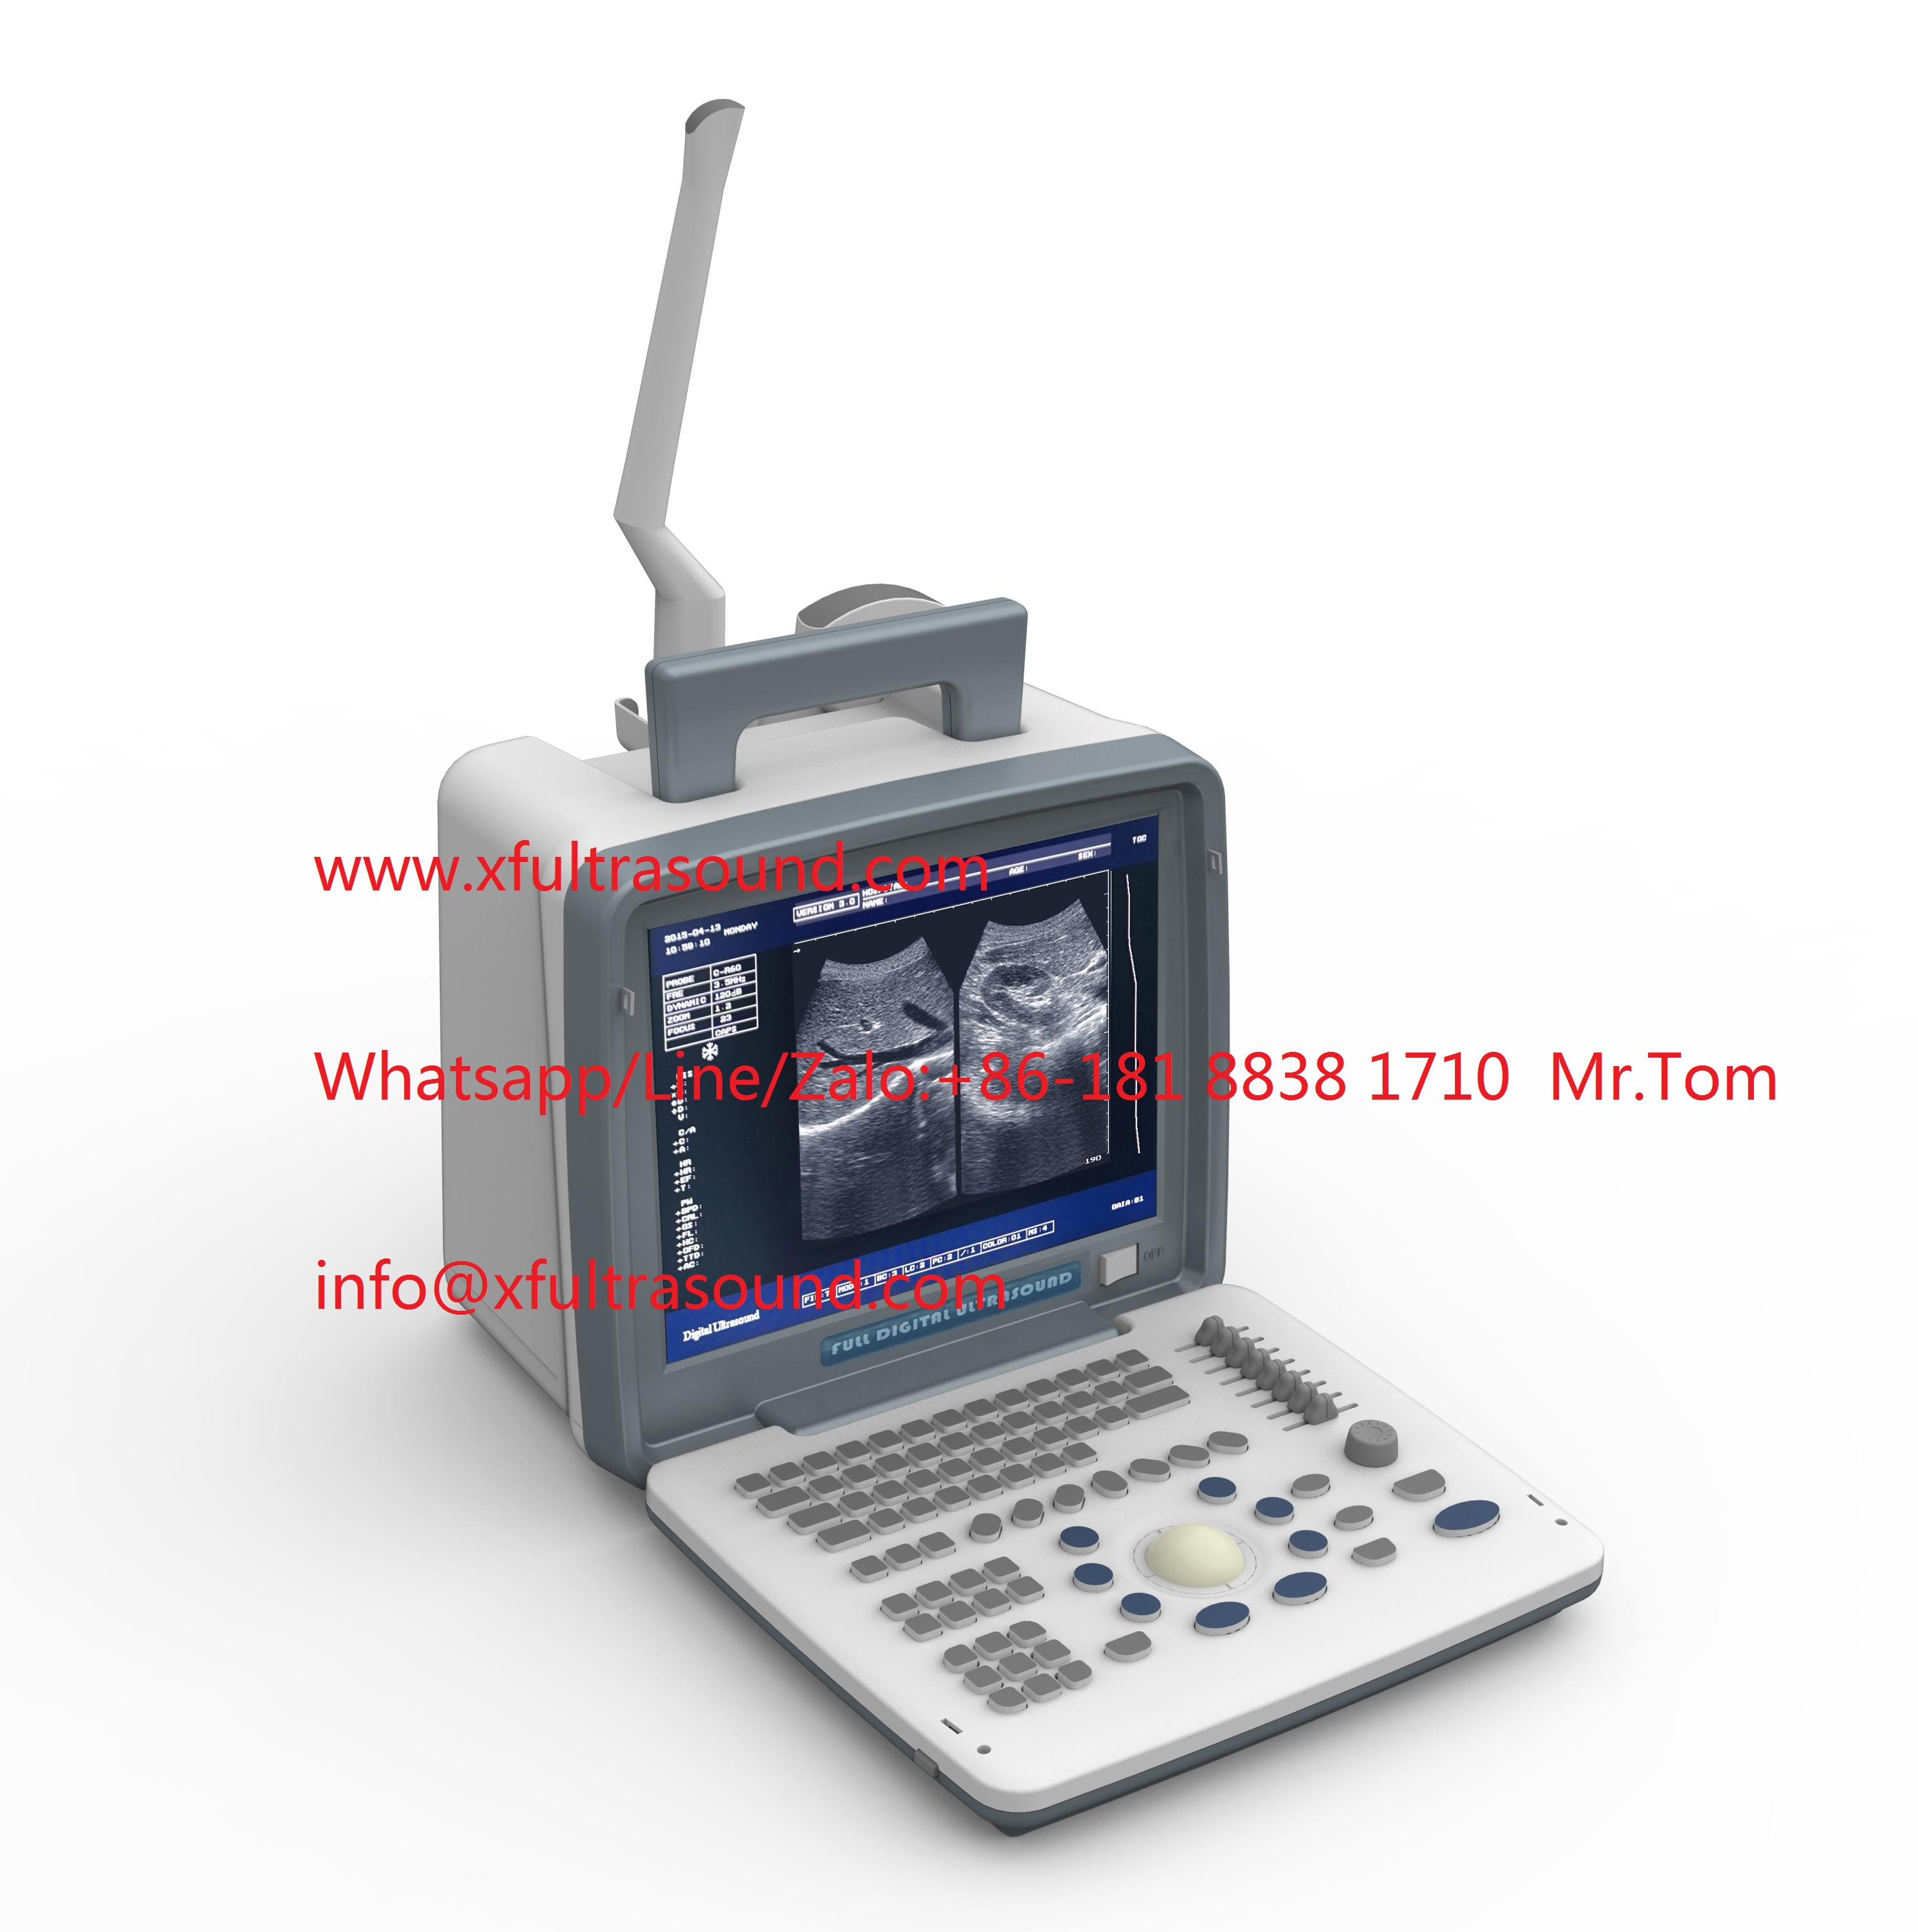 B&W Portable Ultrasound Scanner XF300 LED